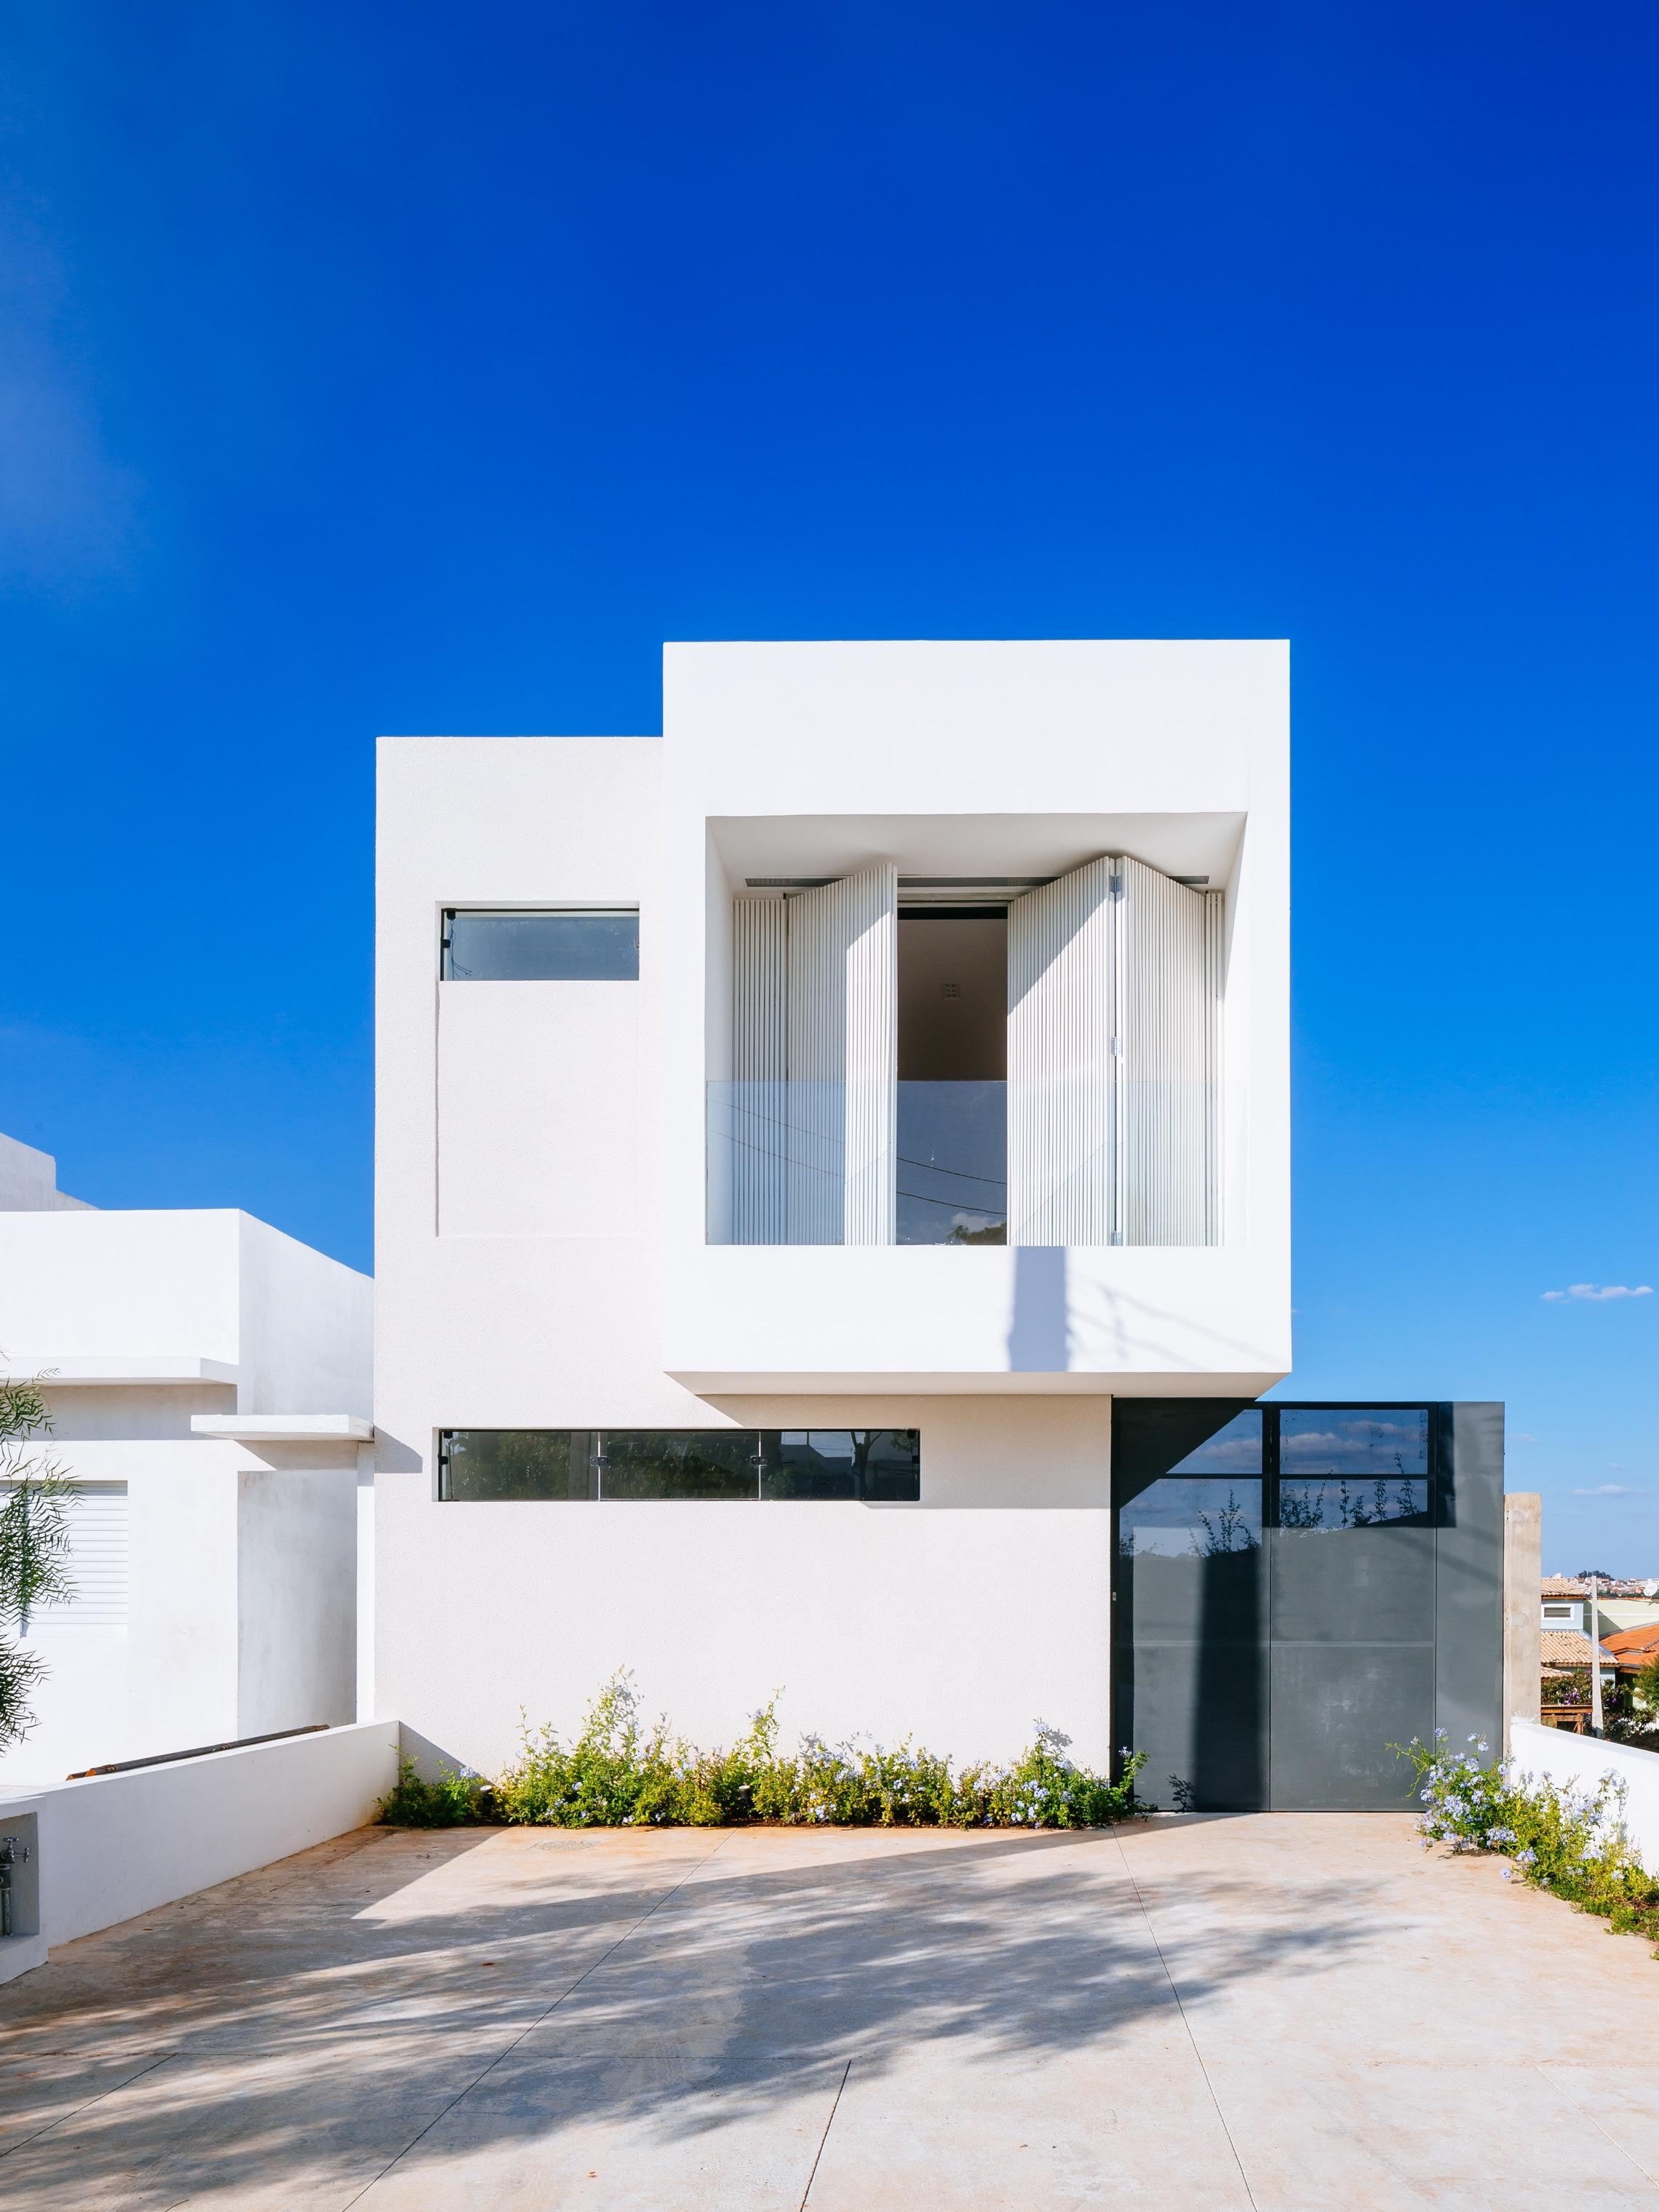 Sencilla casa de dos pisos con planos y dise o de interiores Fachadas de casas modernas de dos pisos minimalistas